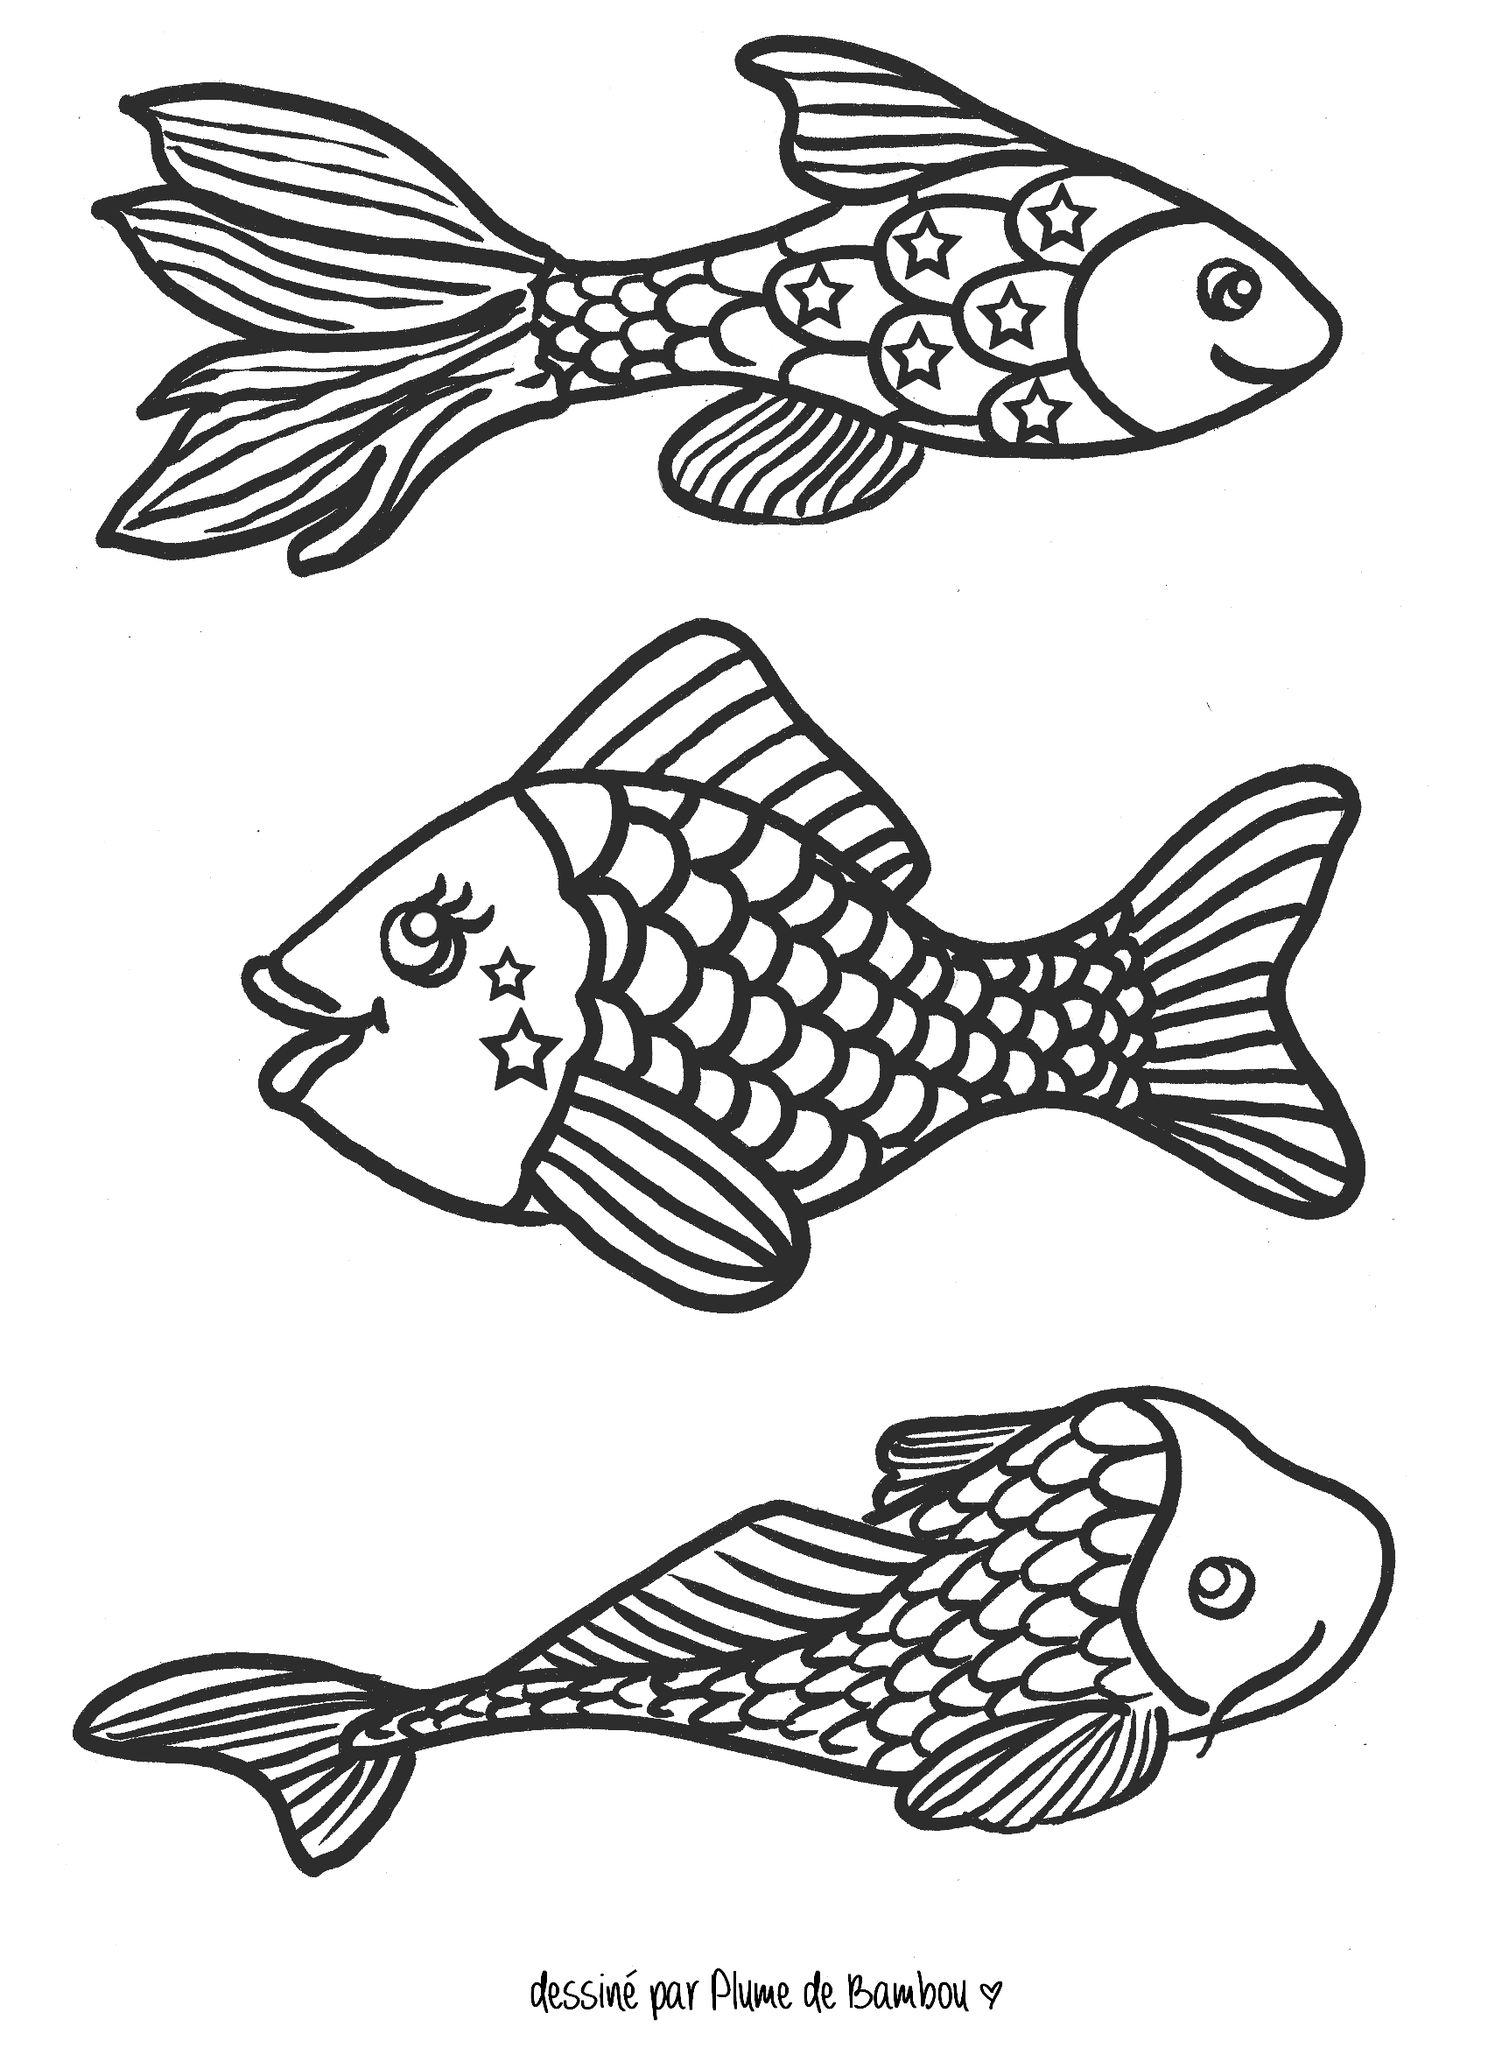 96 dessins de coloriage poisson d 39 avril rigolo a imprimer imprimer. Black Bedroom Furniture Sets. Home Design Ideas